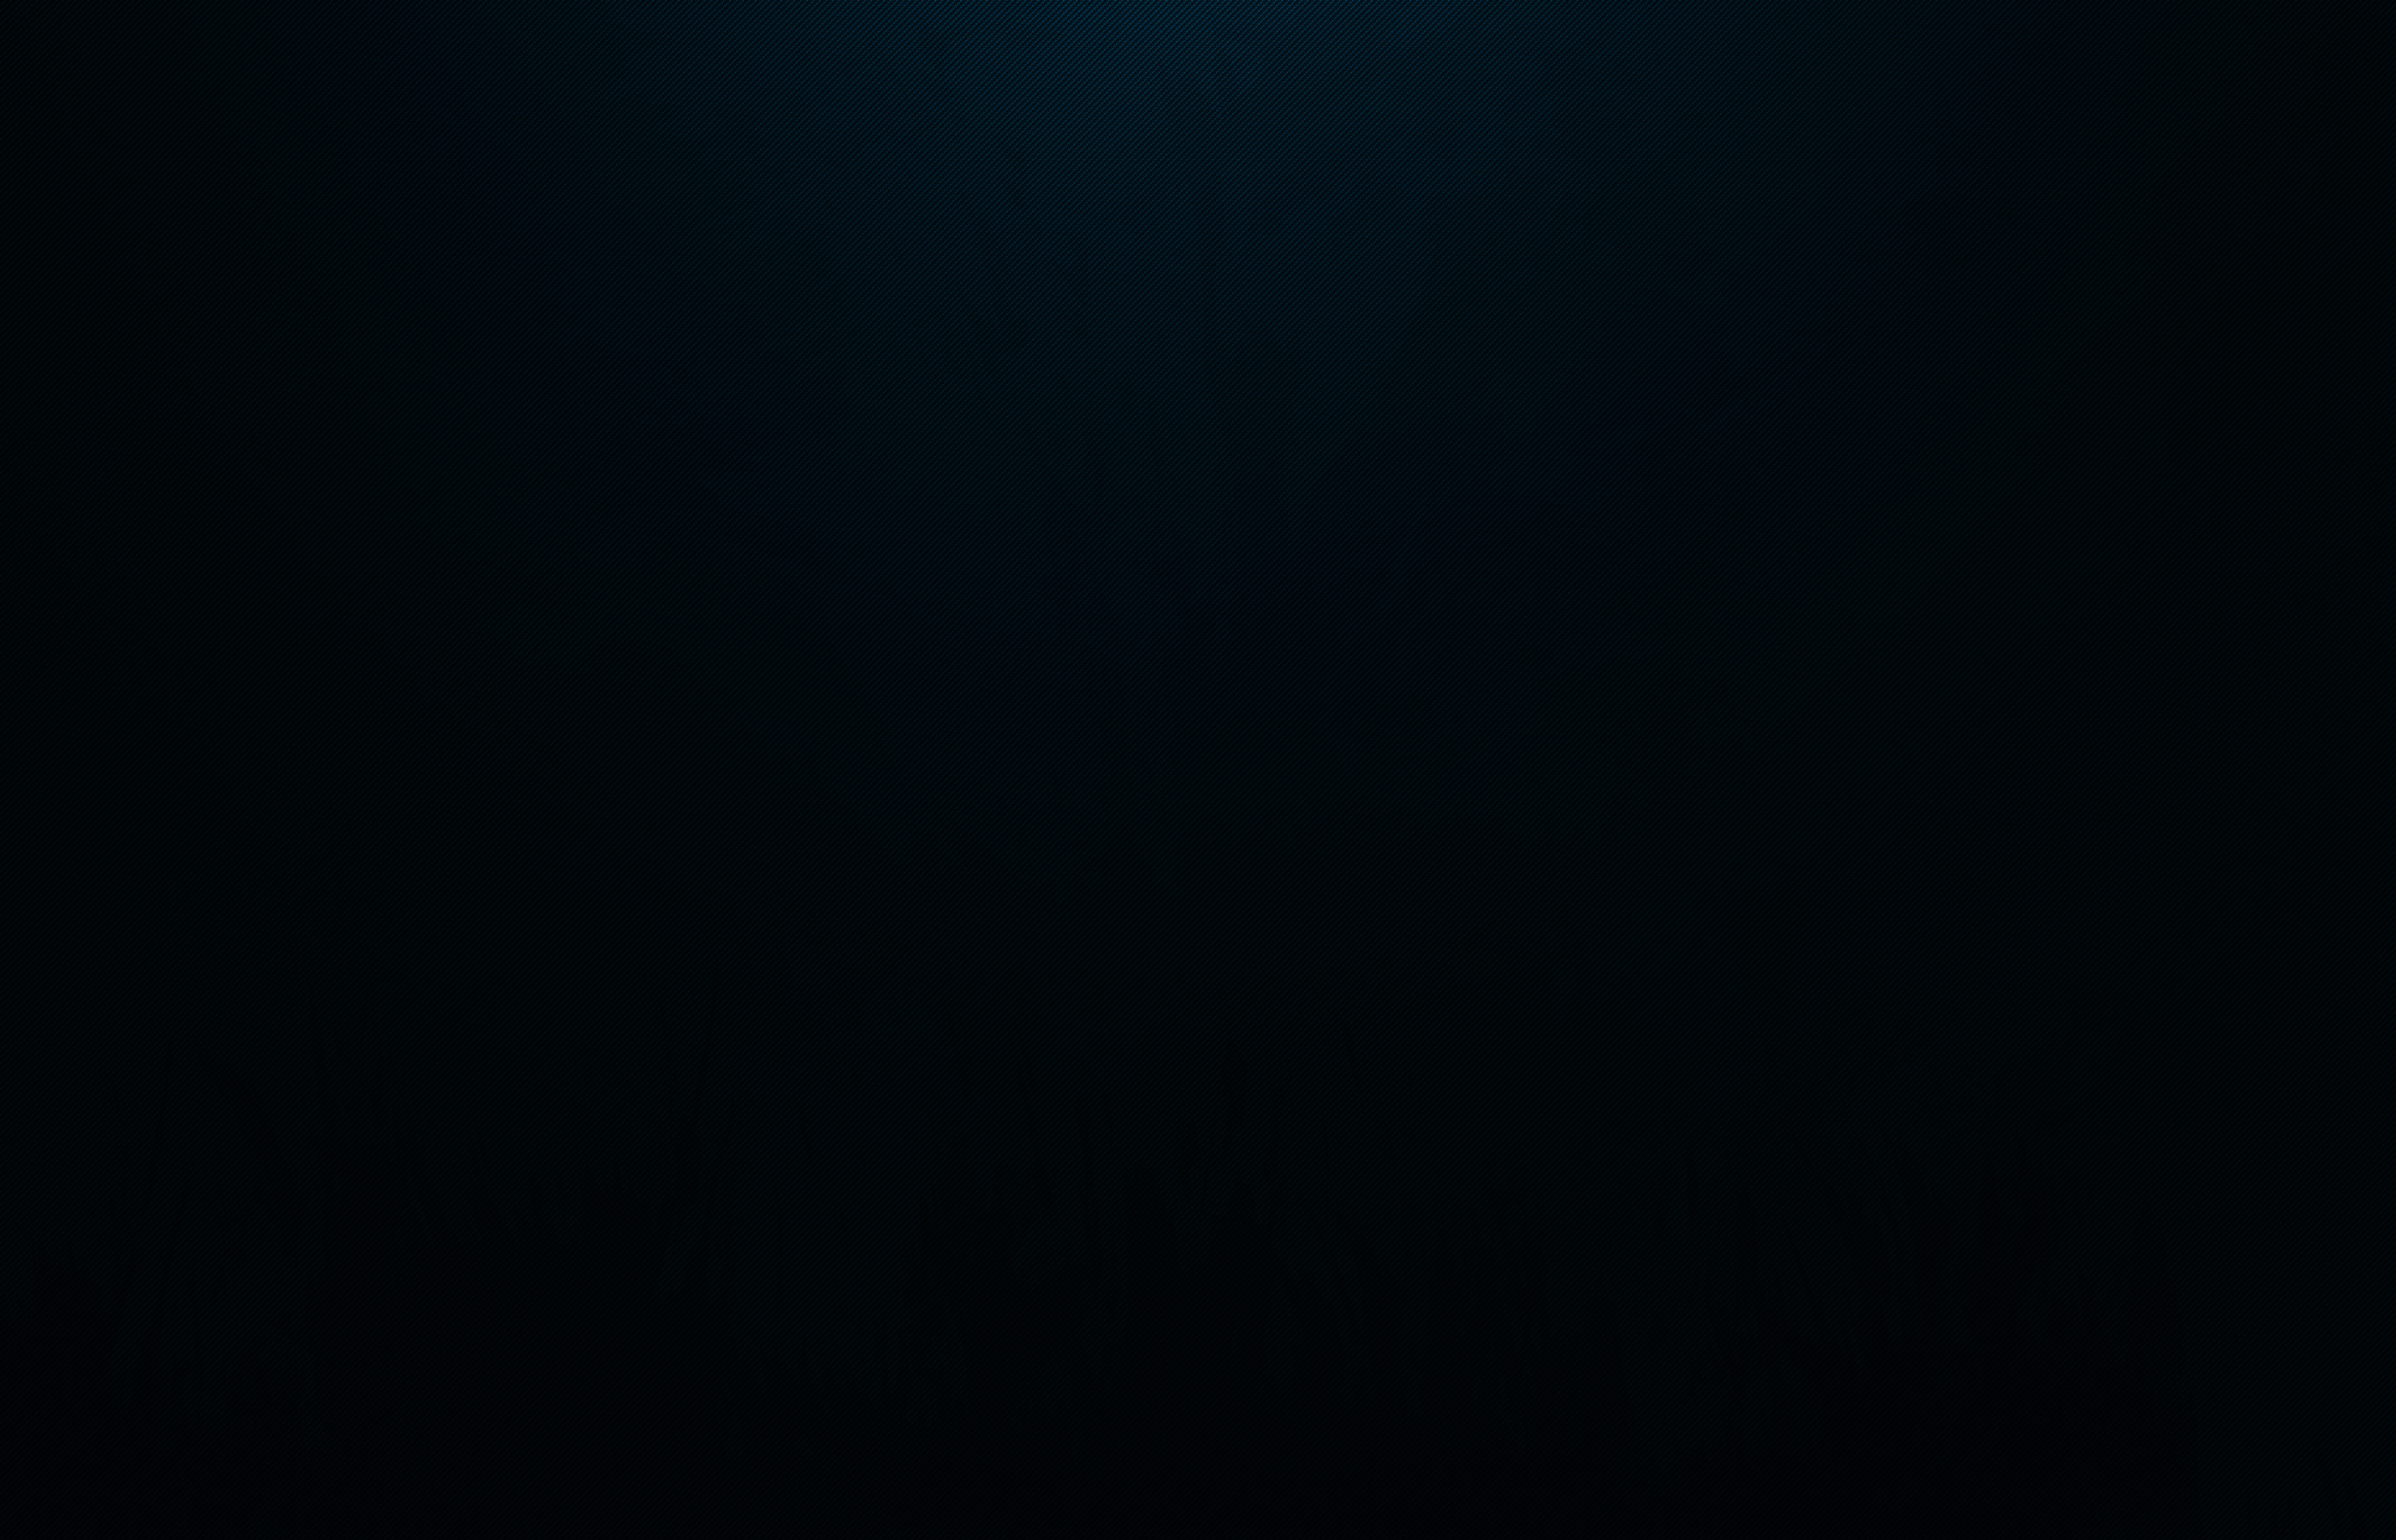 Black Wallpapers High Resolution: Dark Blue Backgrounds